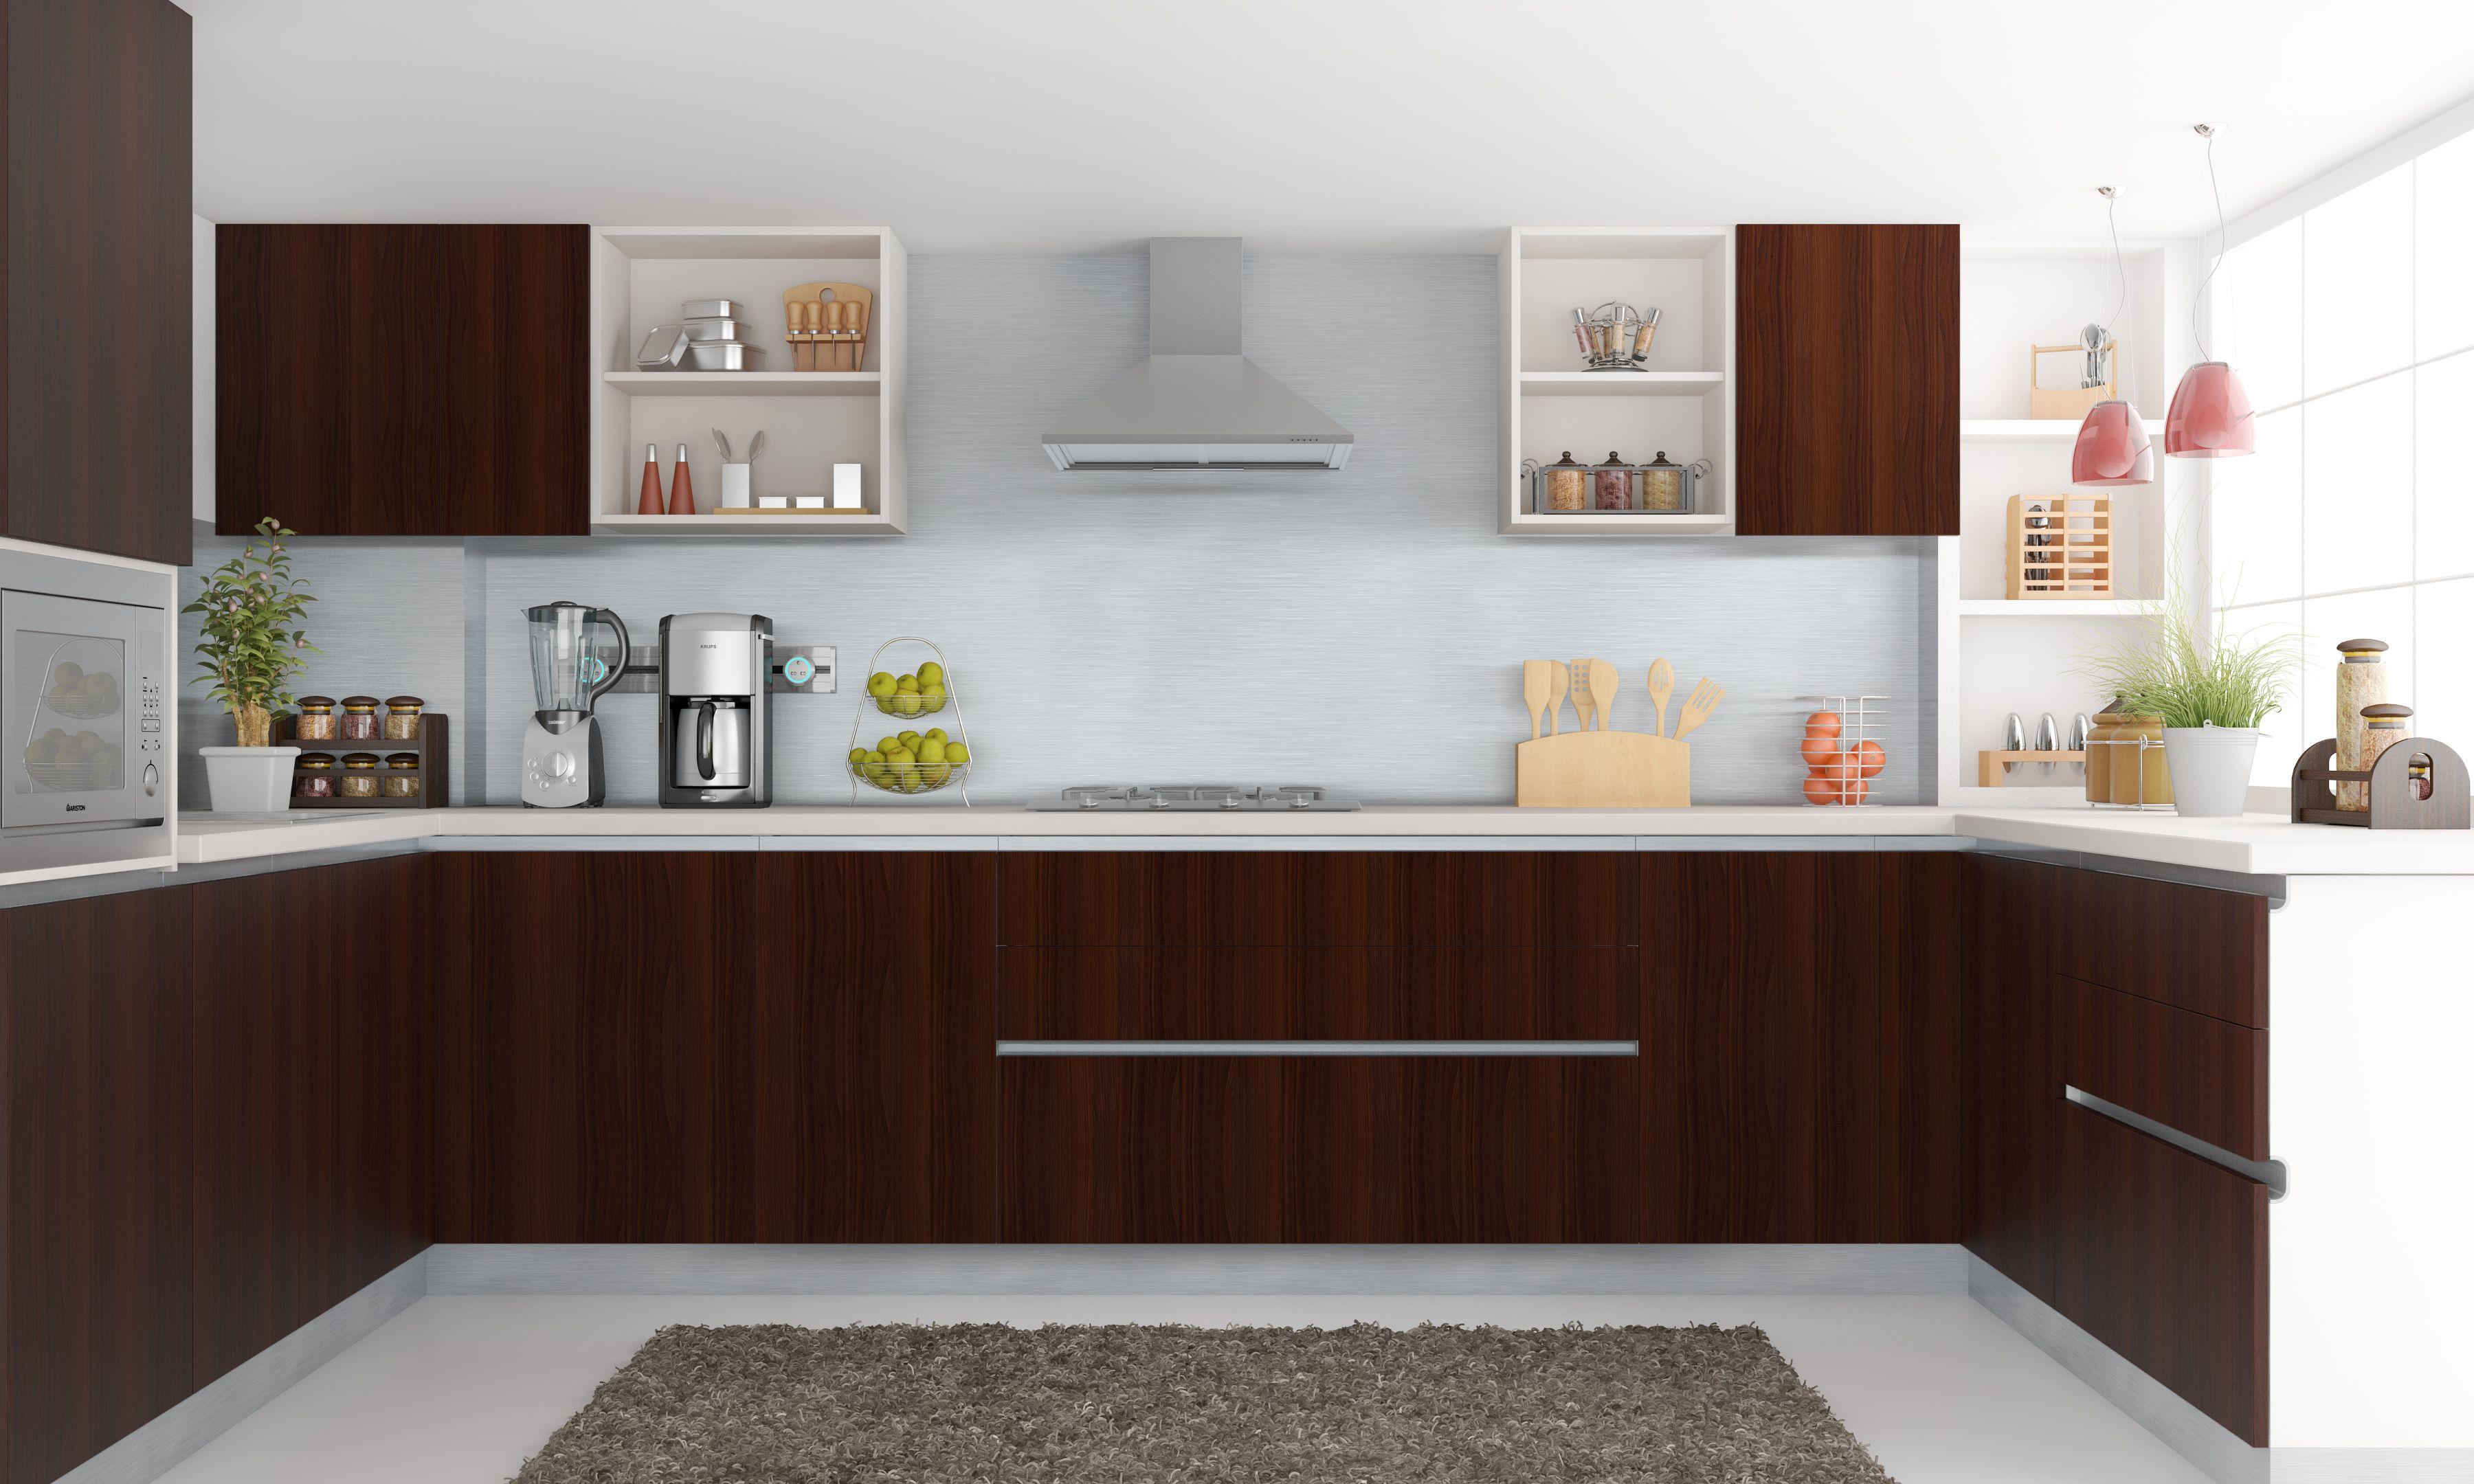 U_Shape #modular #kitchen #lifestyle  Designs  Pinterest  Kitchens Stunning Modular Kitchen U Shaped Design Decorating Design